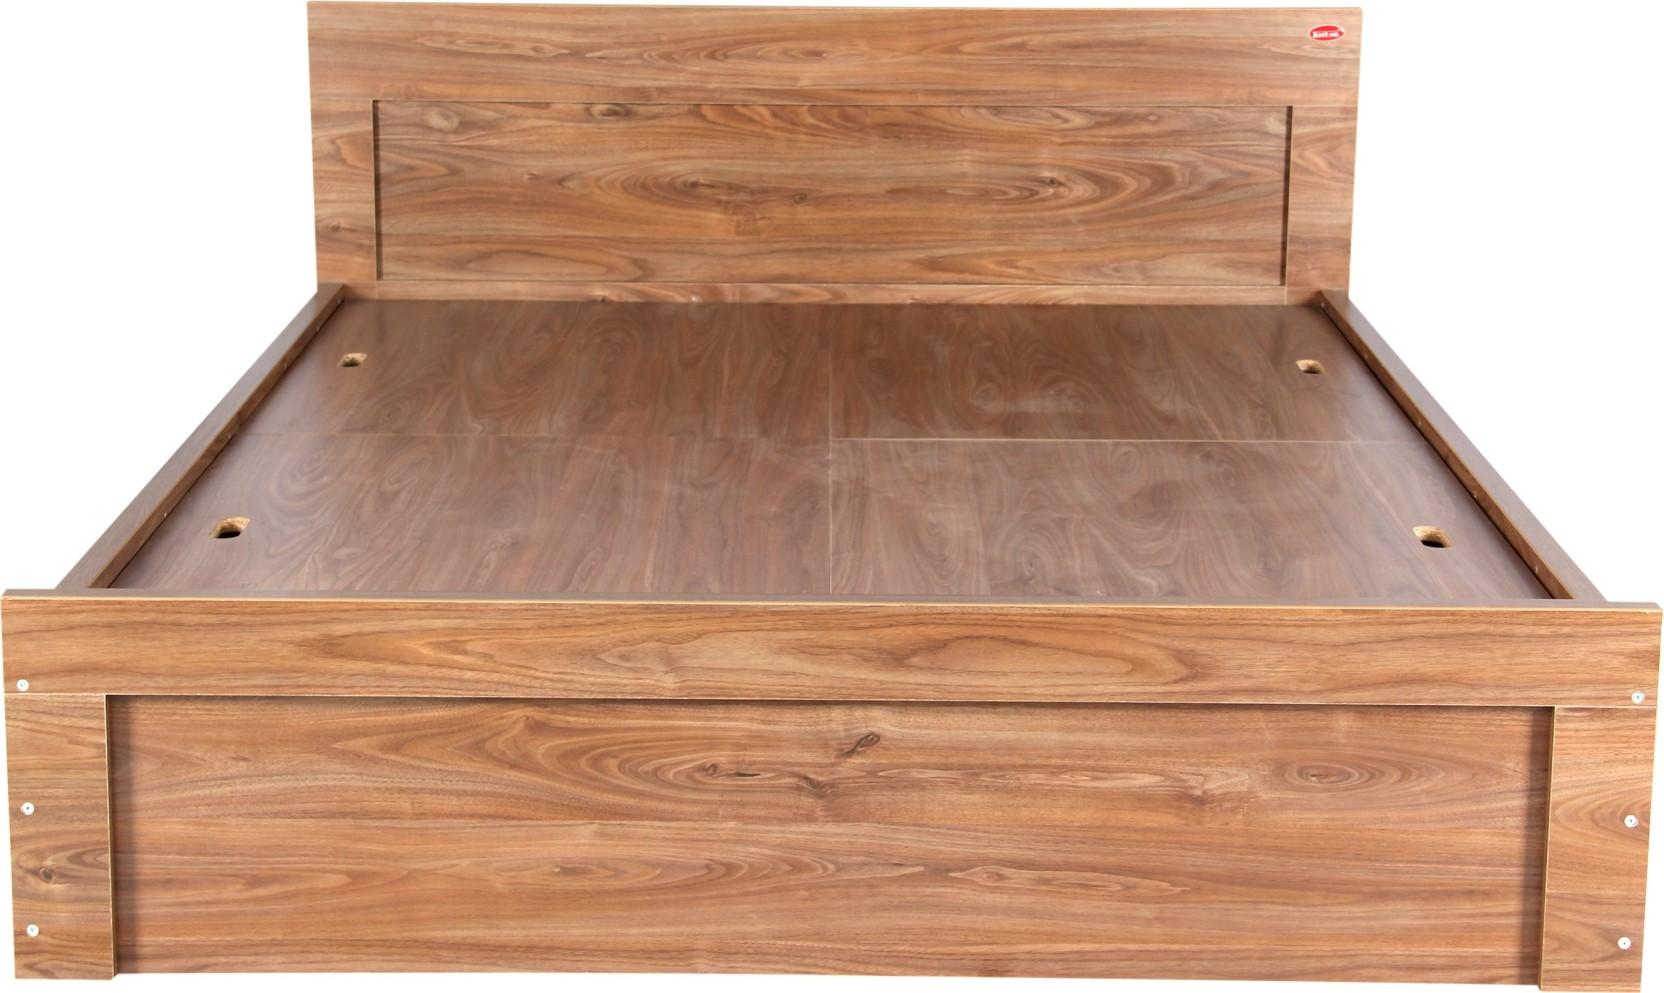 Kurlon sturdy engineered wood king bed finish color walnut